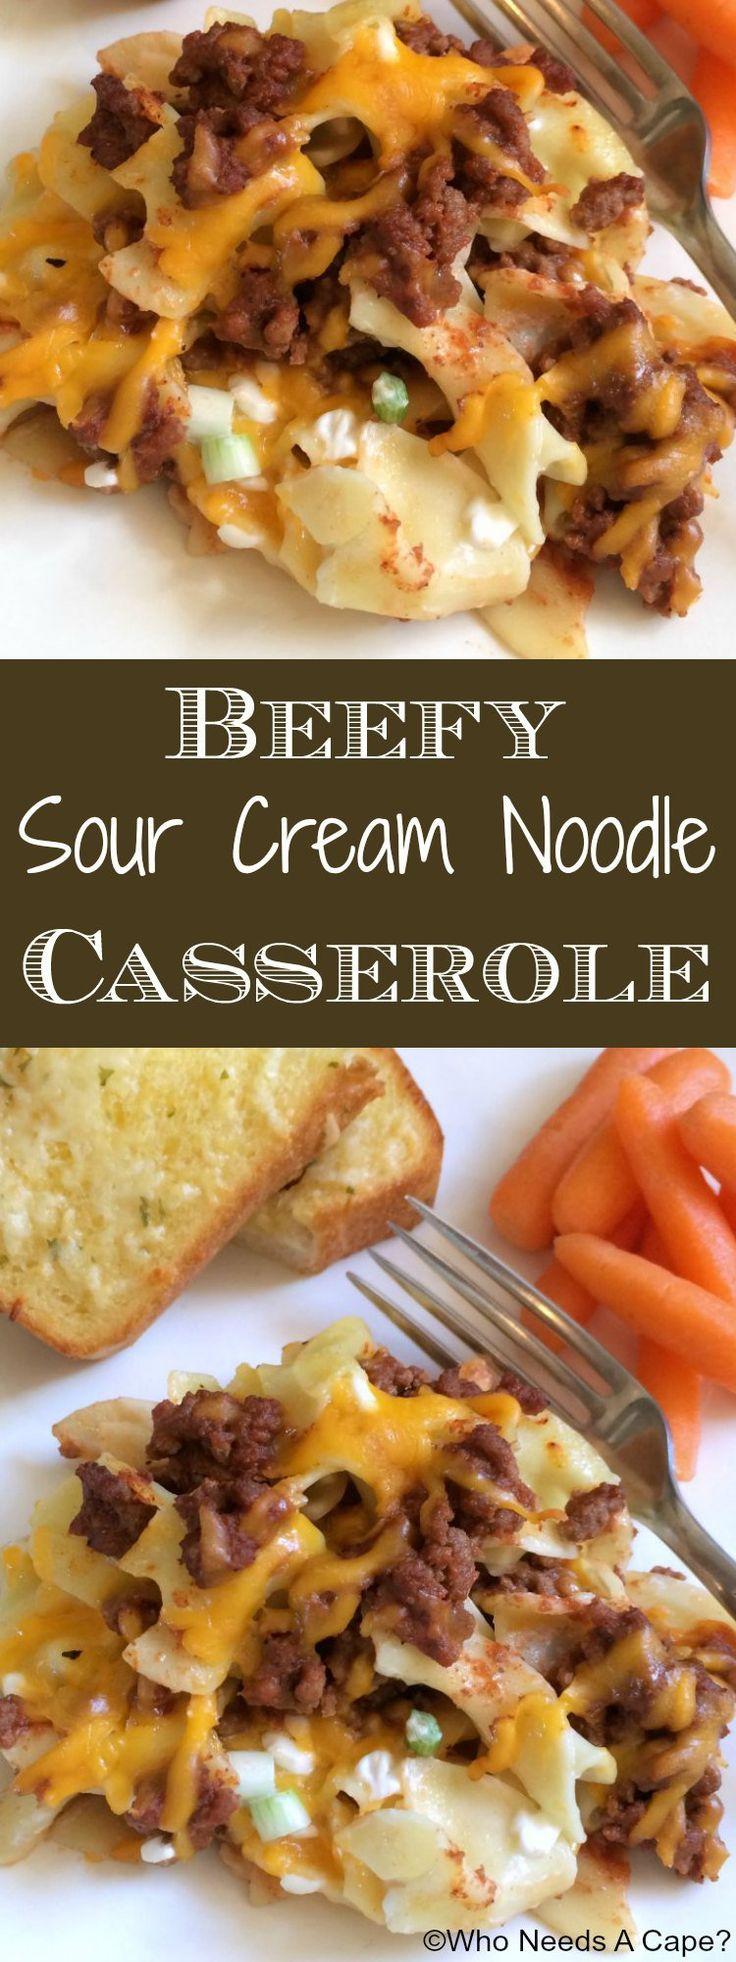 60 best Oodles of NOODLES images on Pinterest | Cooking food ...